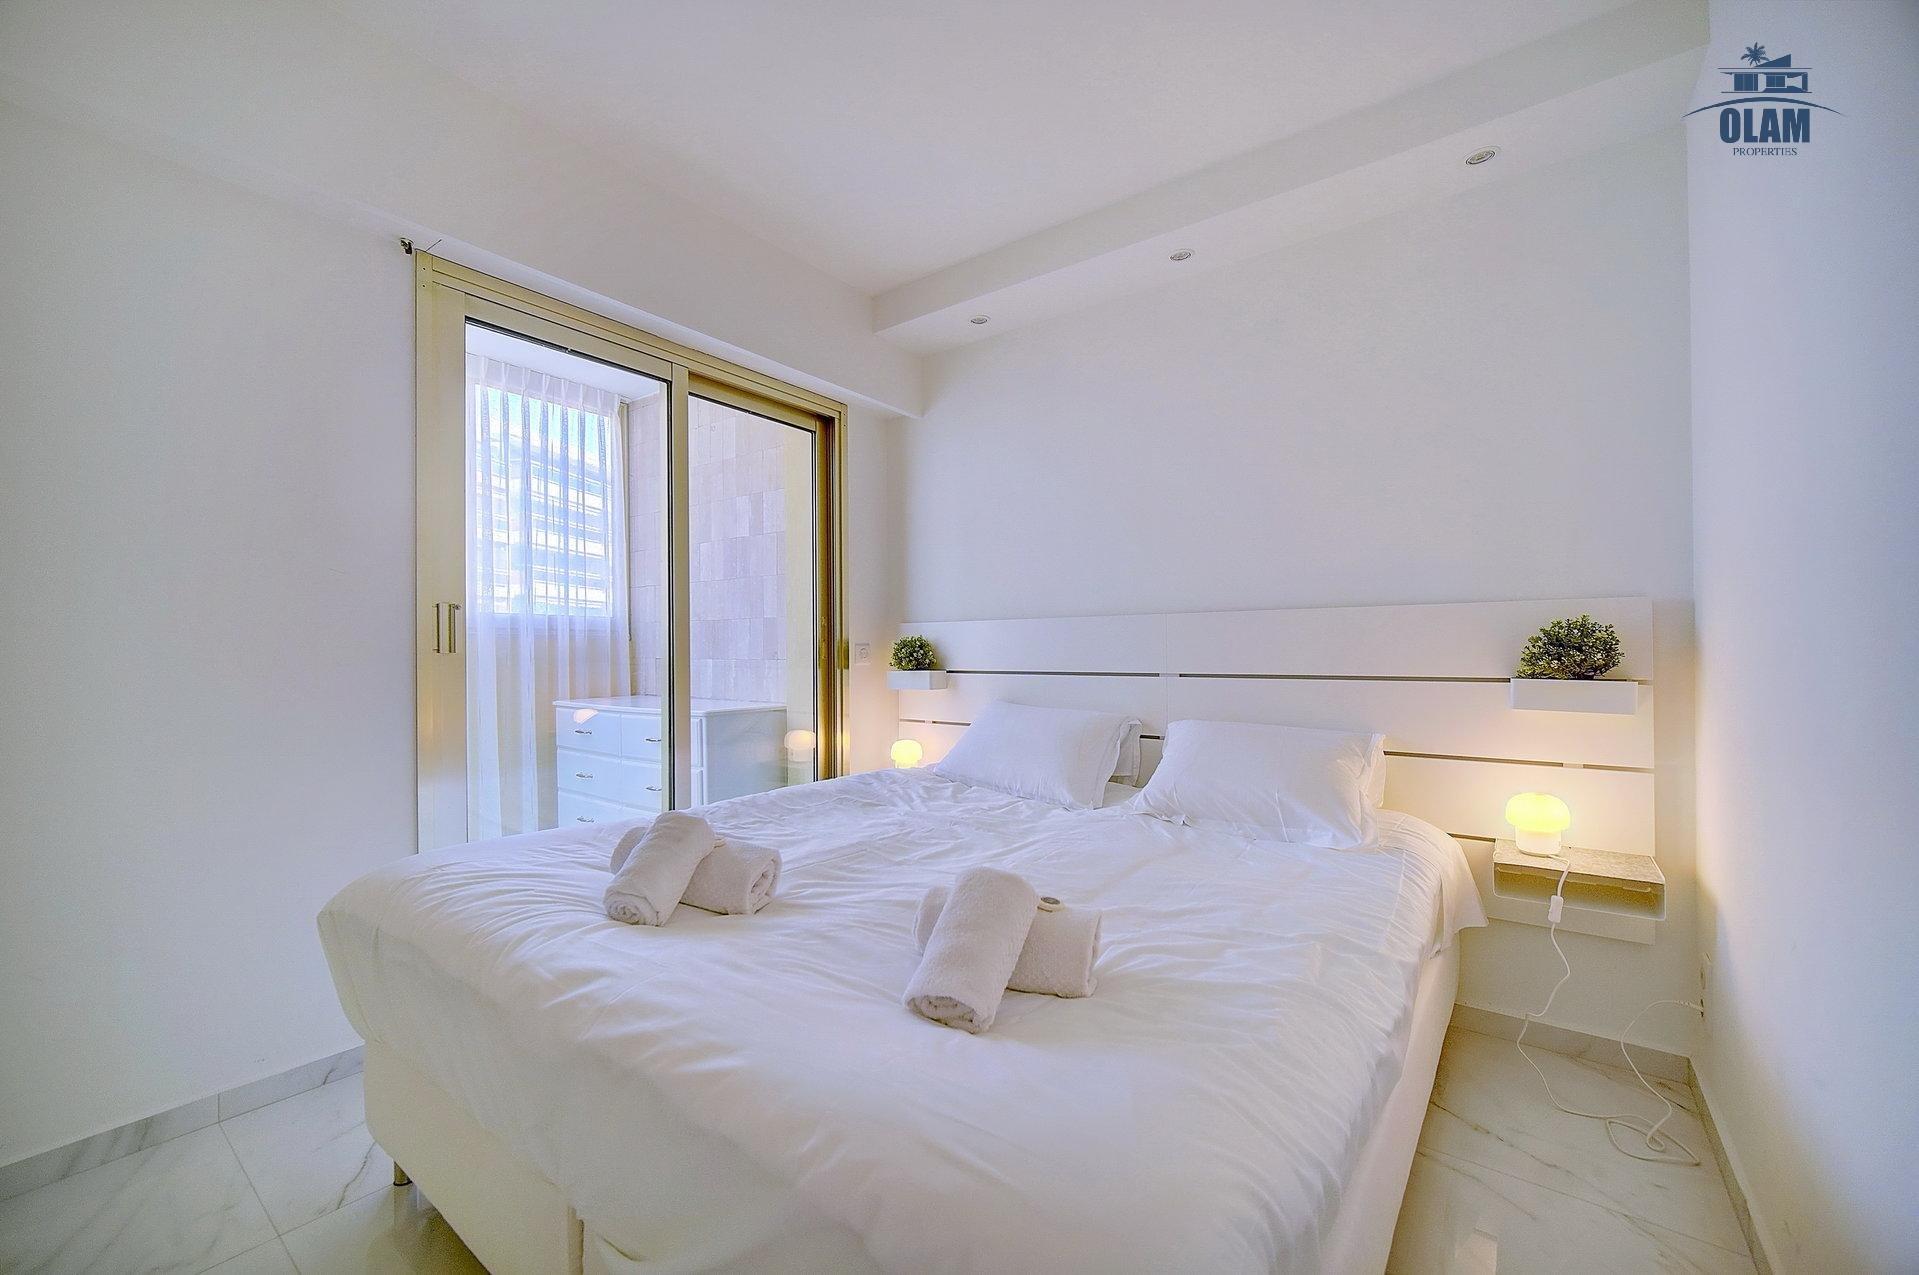 Bedroom, Cannes, Croisette, Seasonal rental, French Riviera